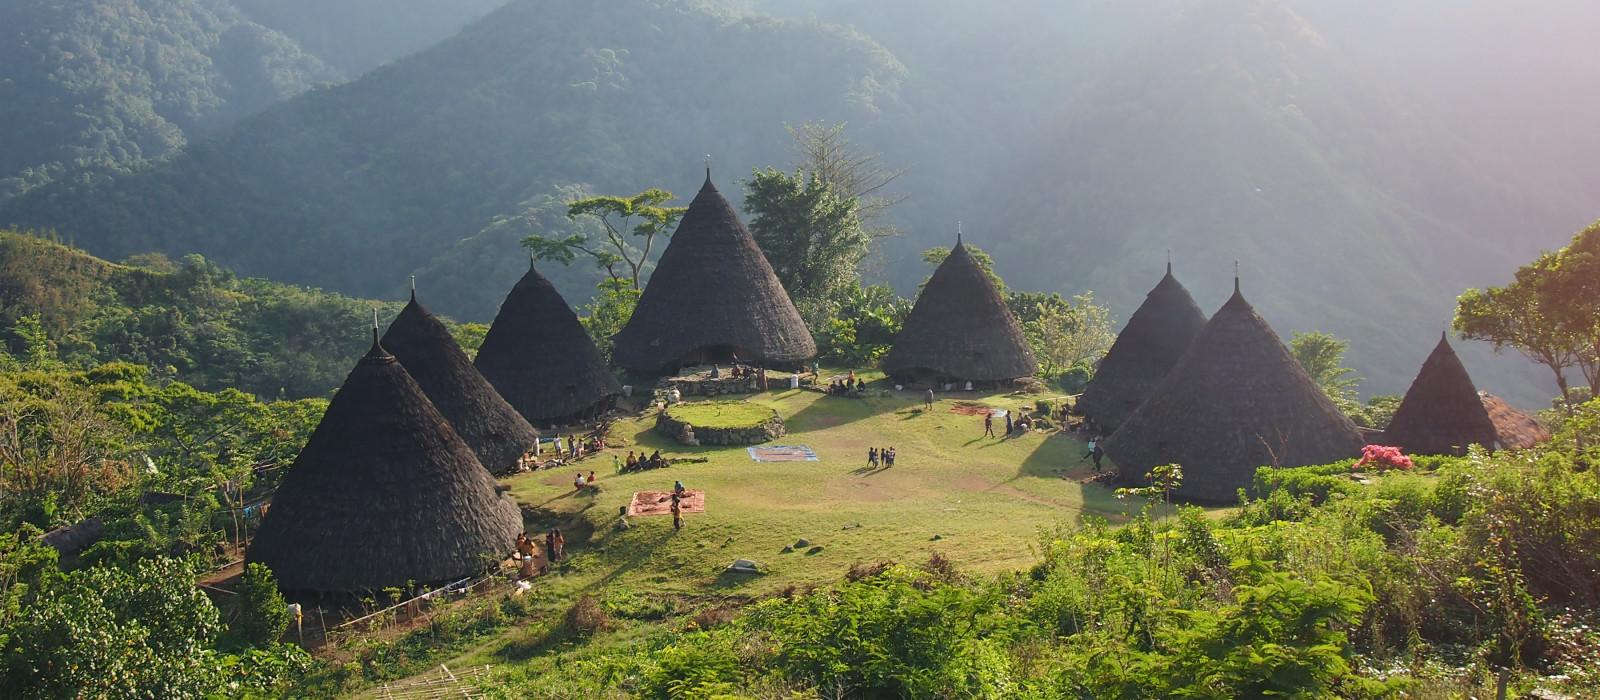 Wae Rebo Village in Flores Indonesia, Asia